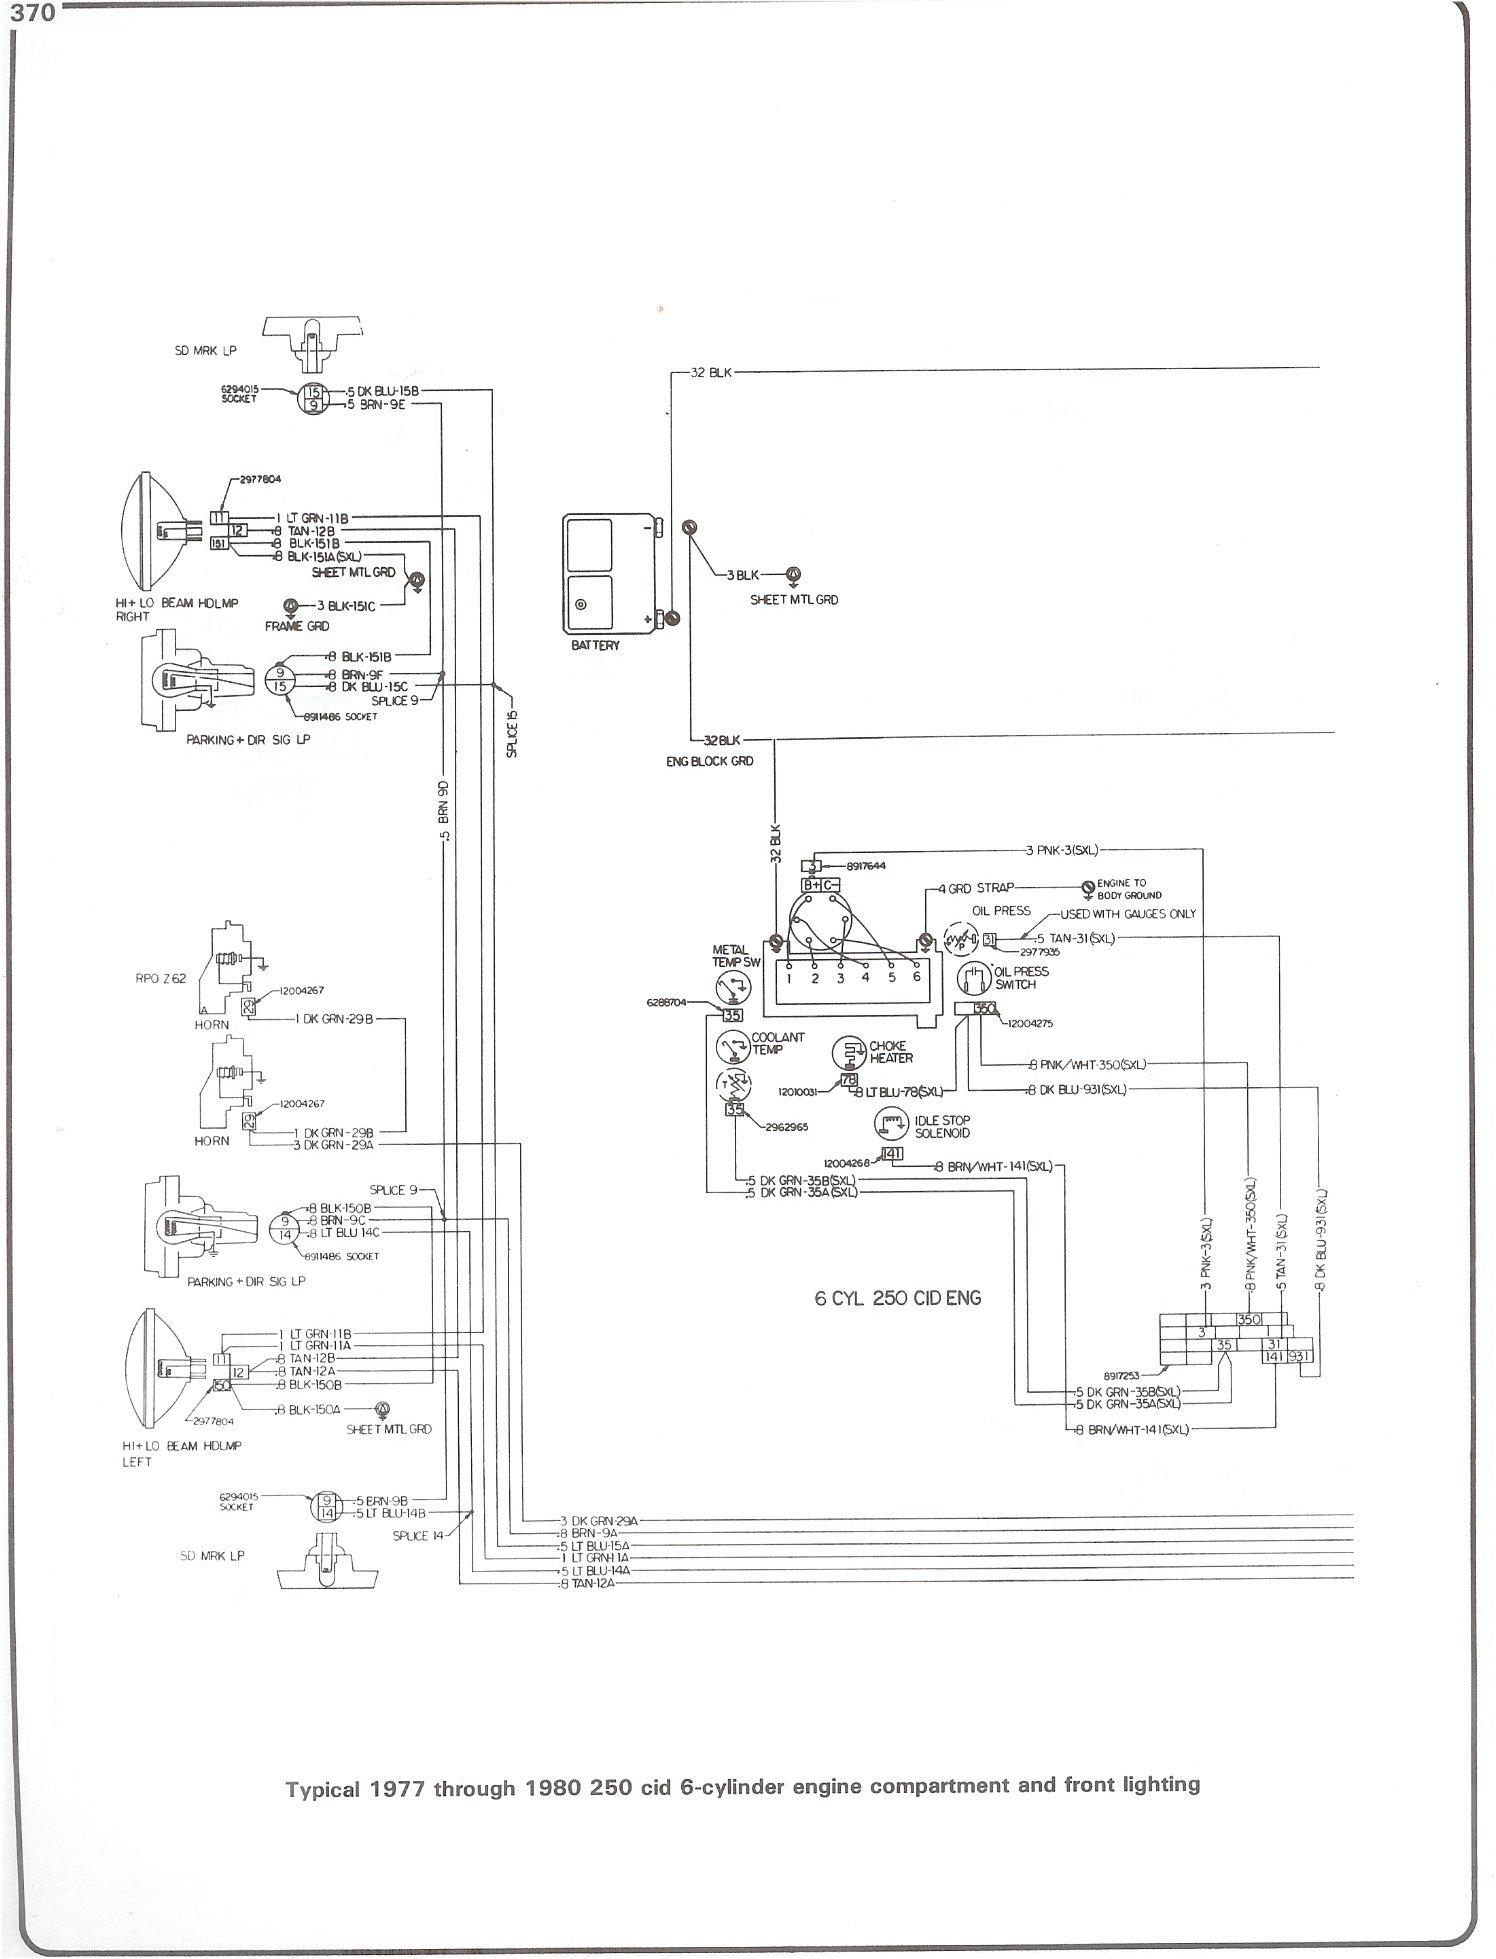 73 87 Chevy Truck Instrument Cluster Wiring : chevy, truck, instrument, cluster, wiring, Complete, 73-87, Wiring, Diagrams